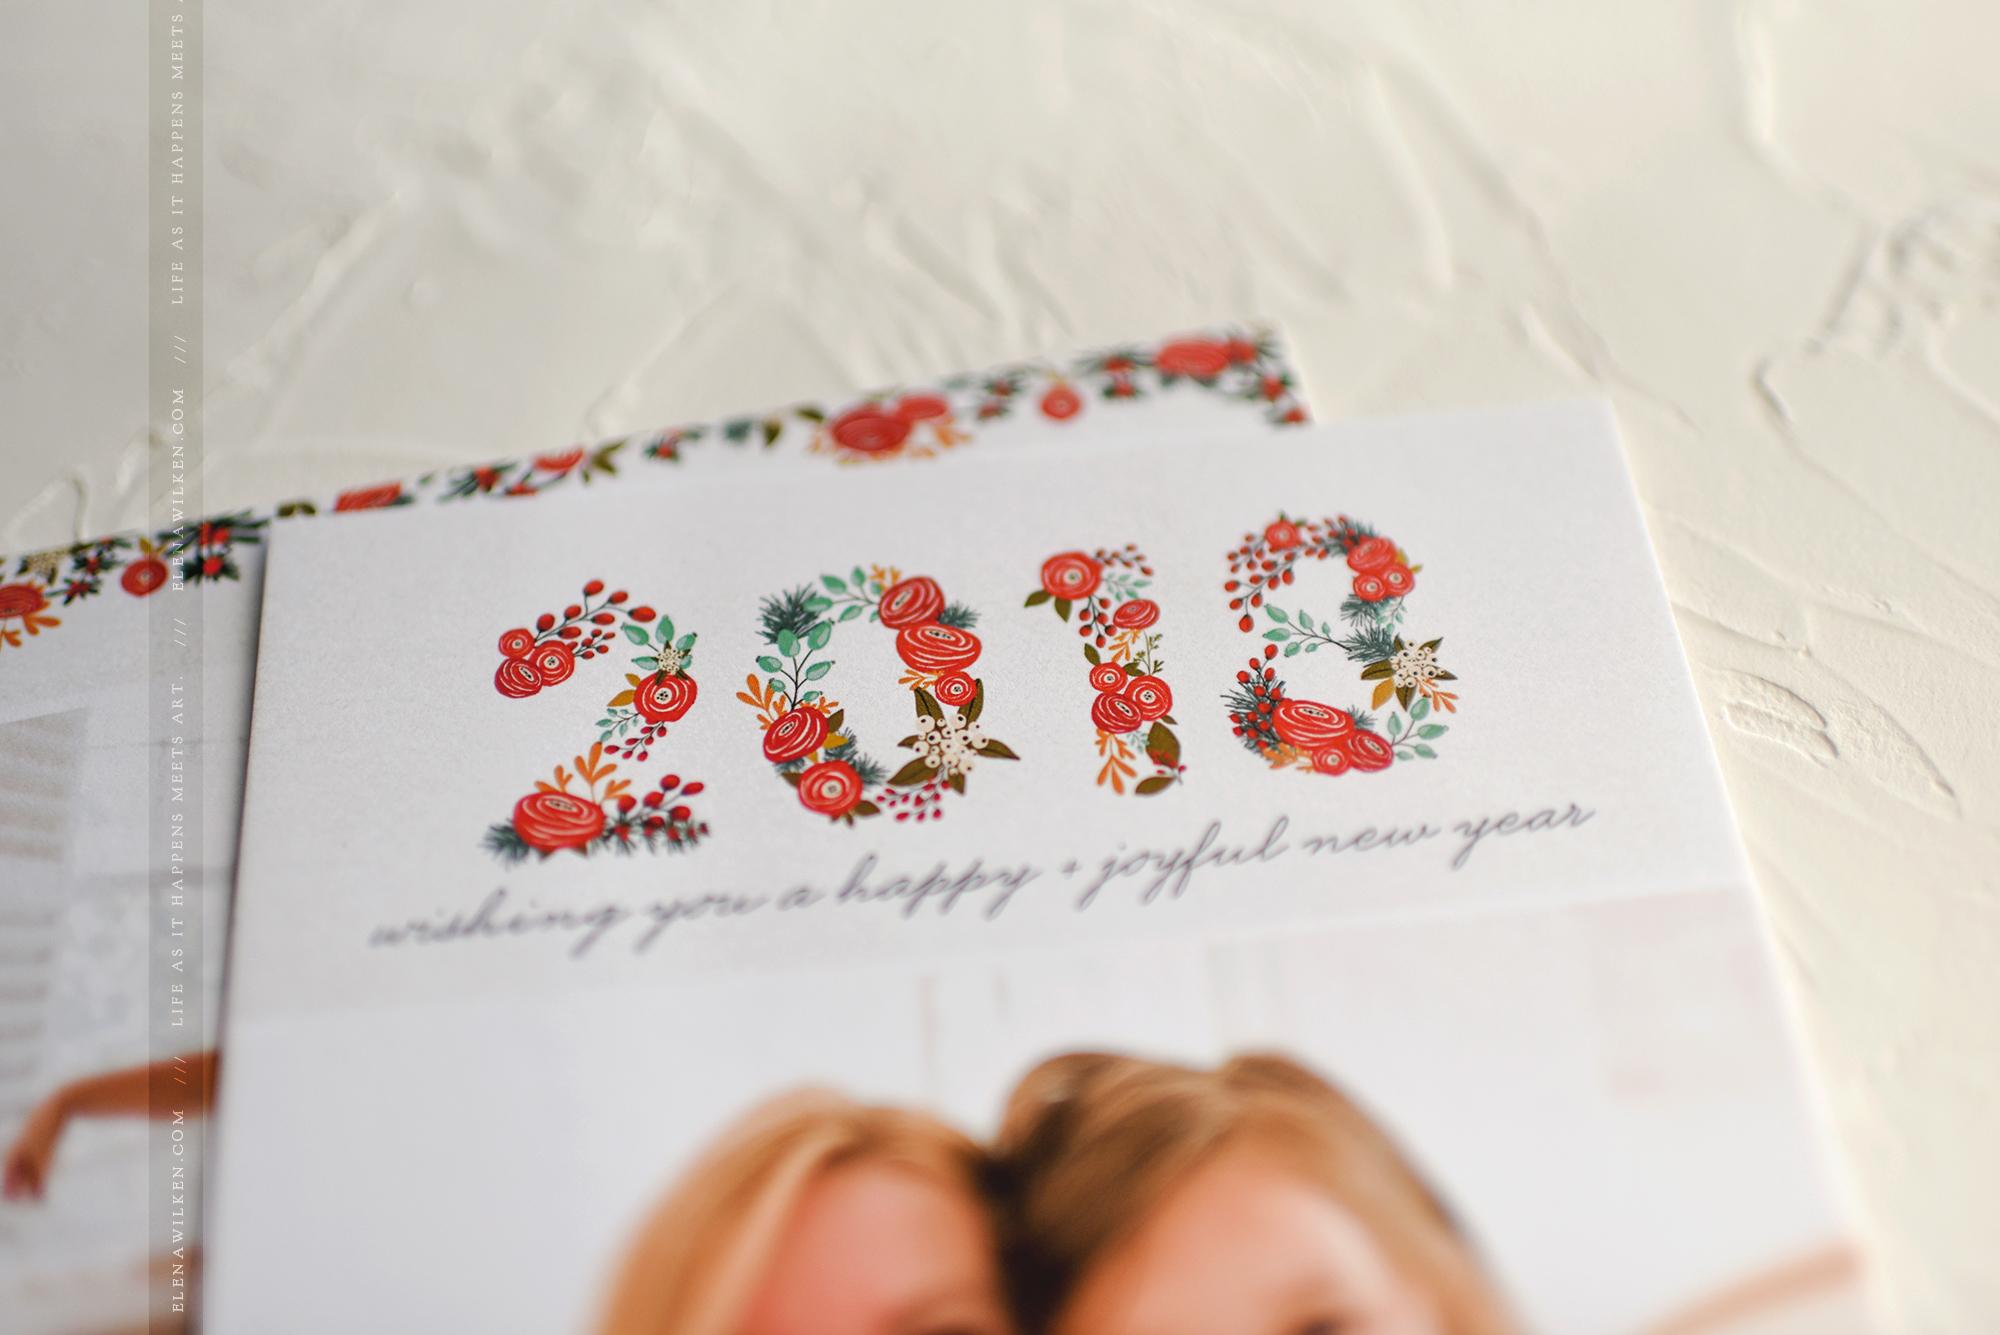 photo-christmas-cards-mpix-surface-pattern-ew-couture-elena-wilken.jpg.jpg